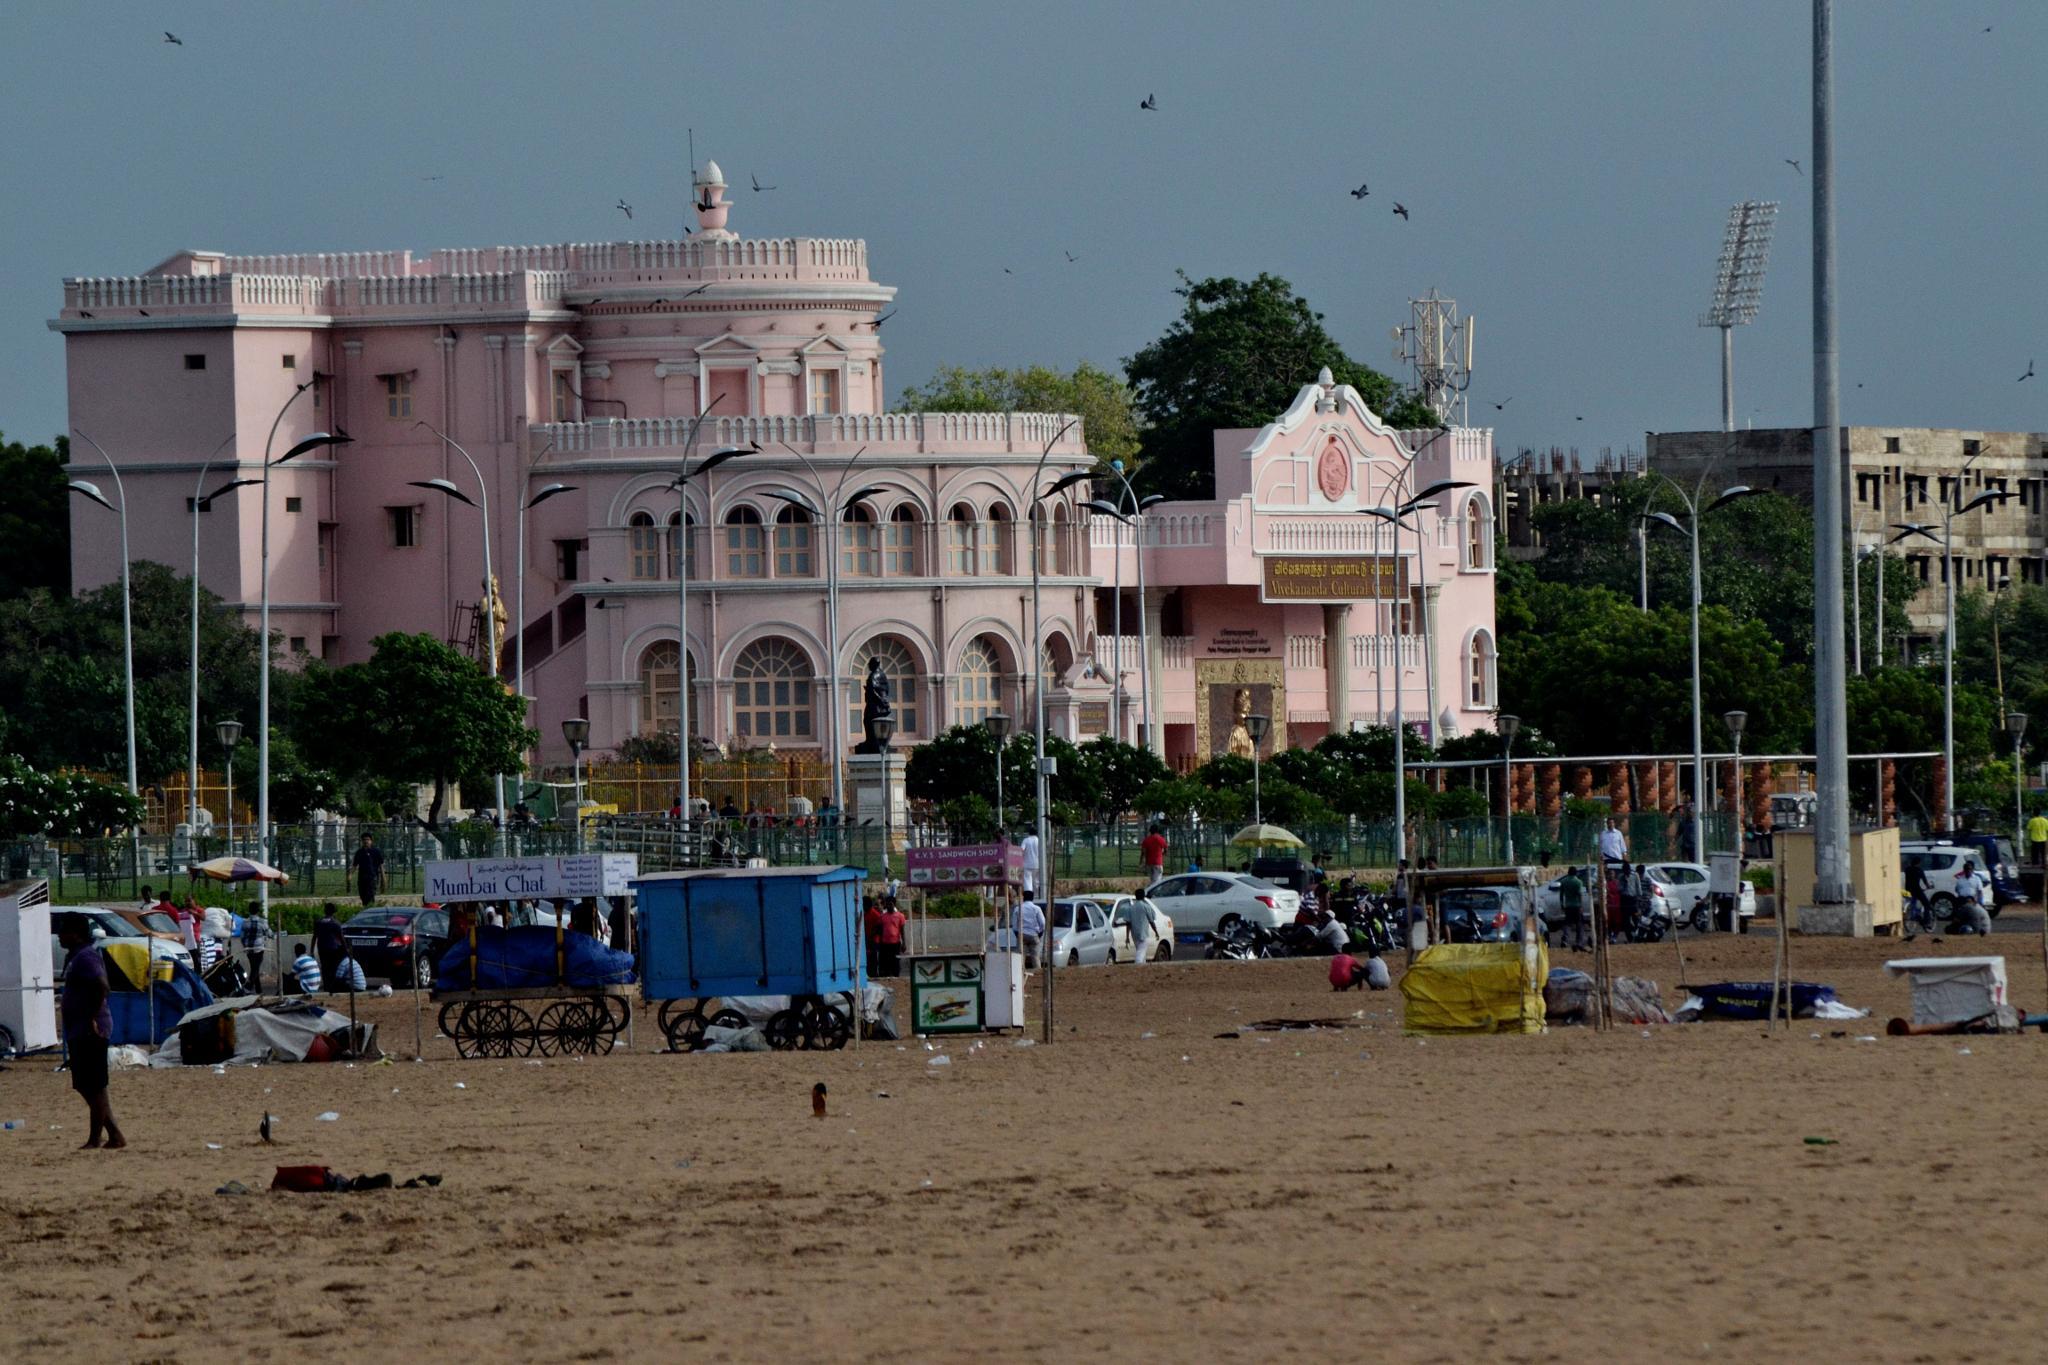 Vivekananda House, Chennai by Radhamadhavan K S